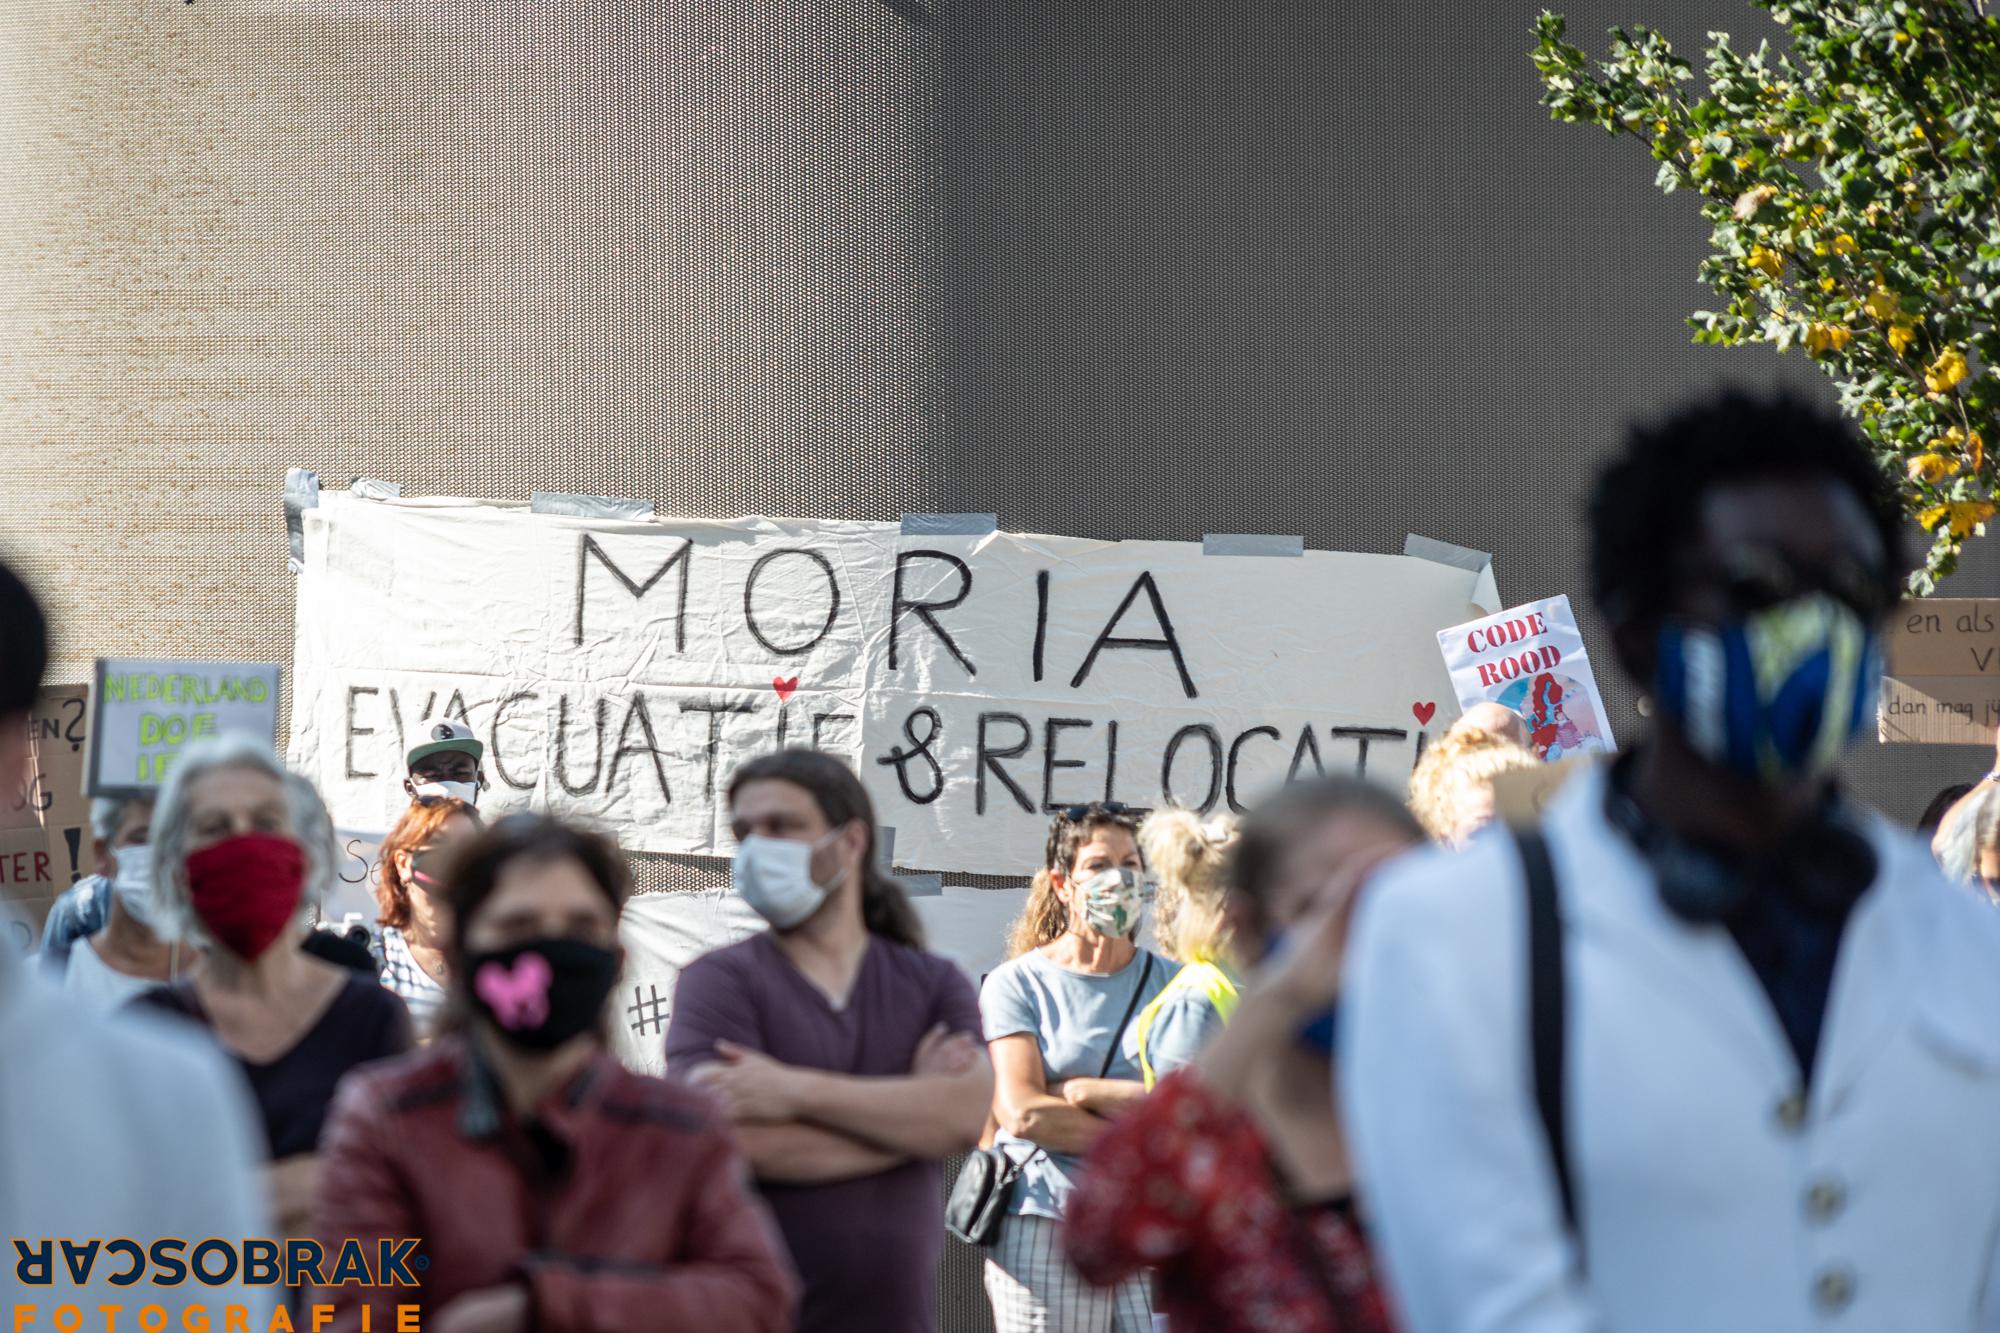 evacueer moria utrecht oscar brak fotografie